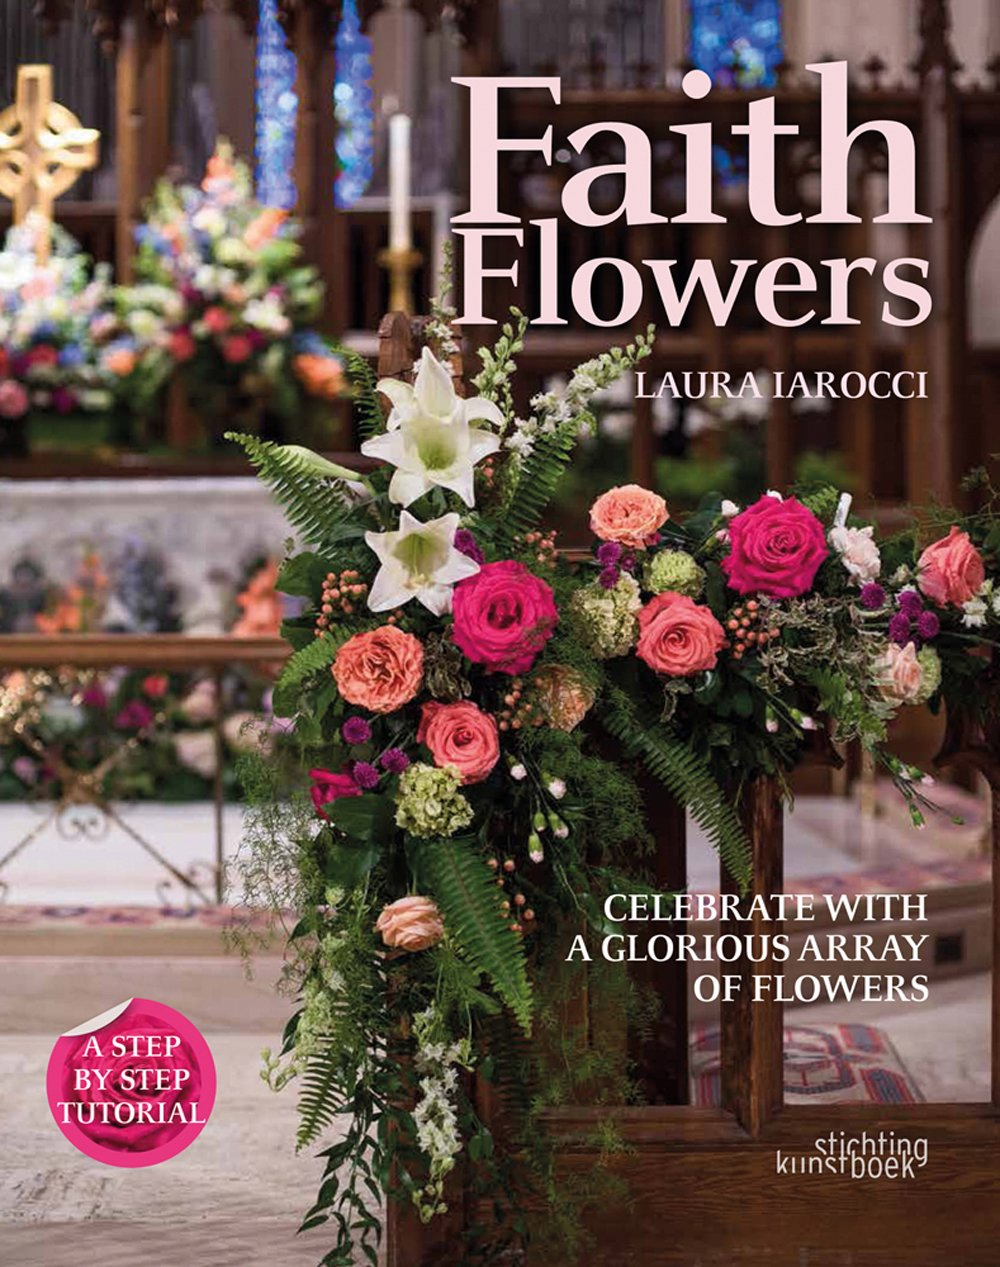 Faith Flowers: Celebrate With a Glorious Array of Flowers